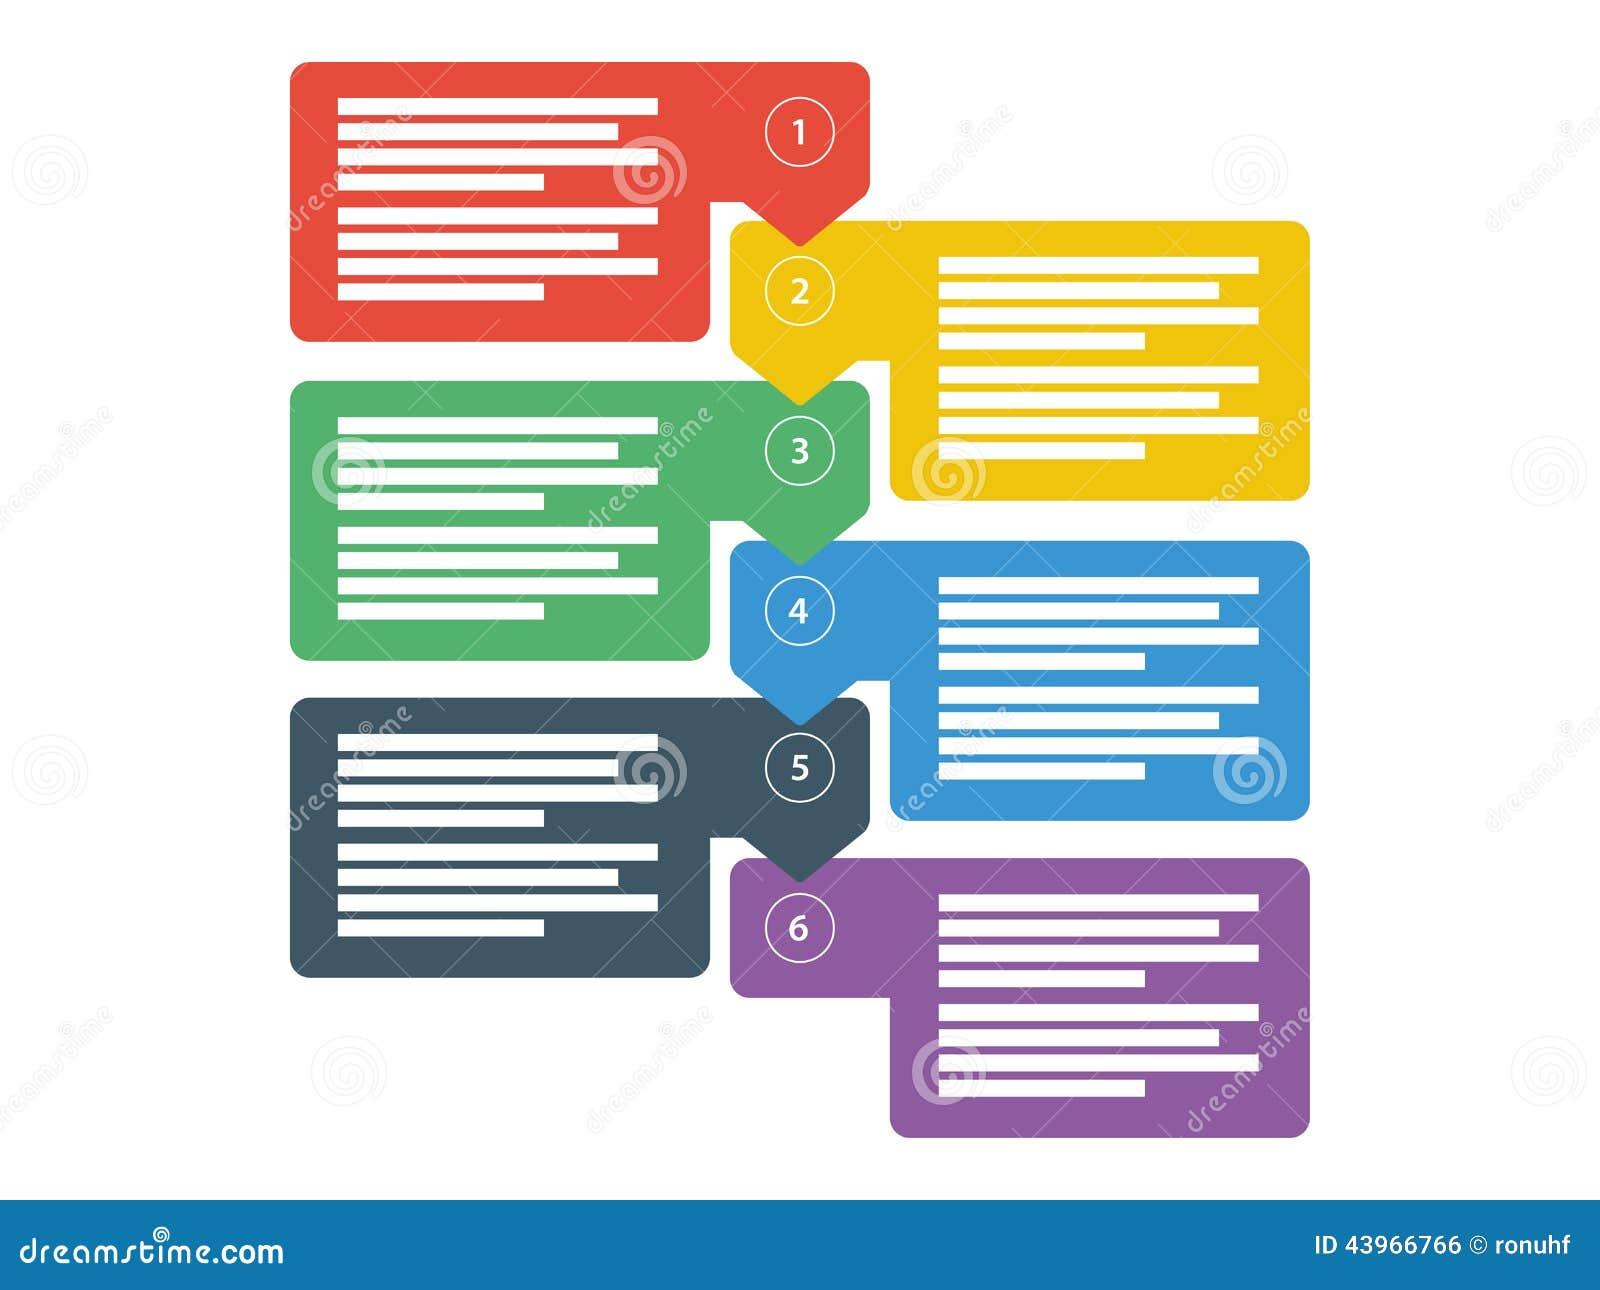 workflow business data presentation diagram infographic elements